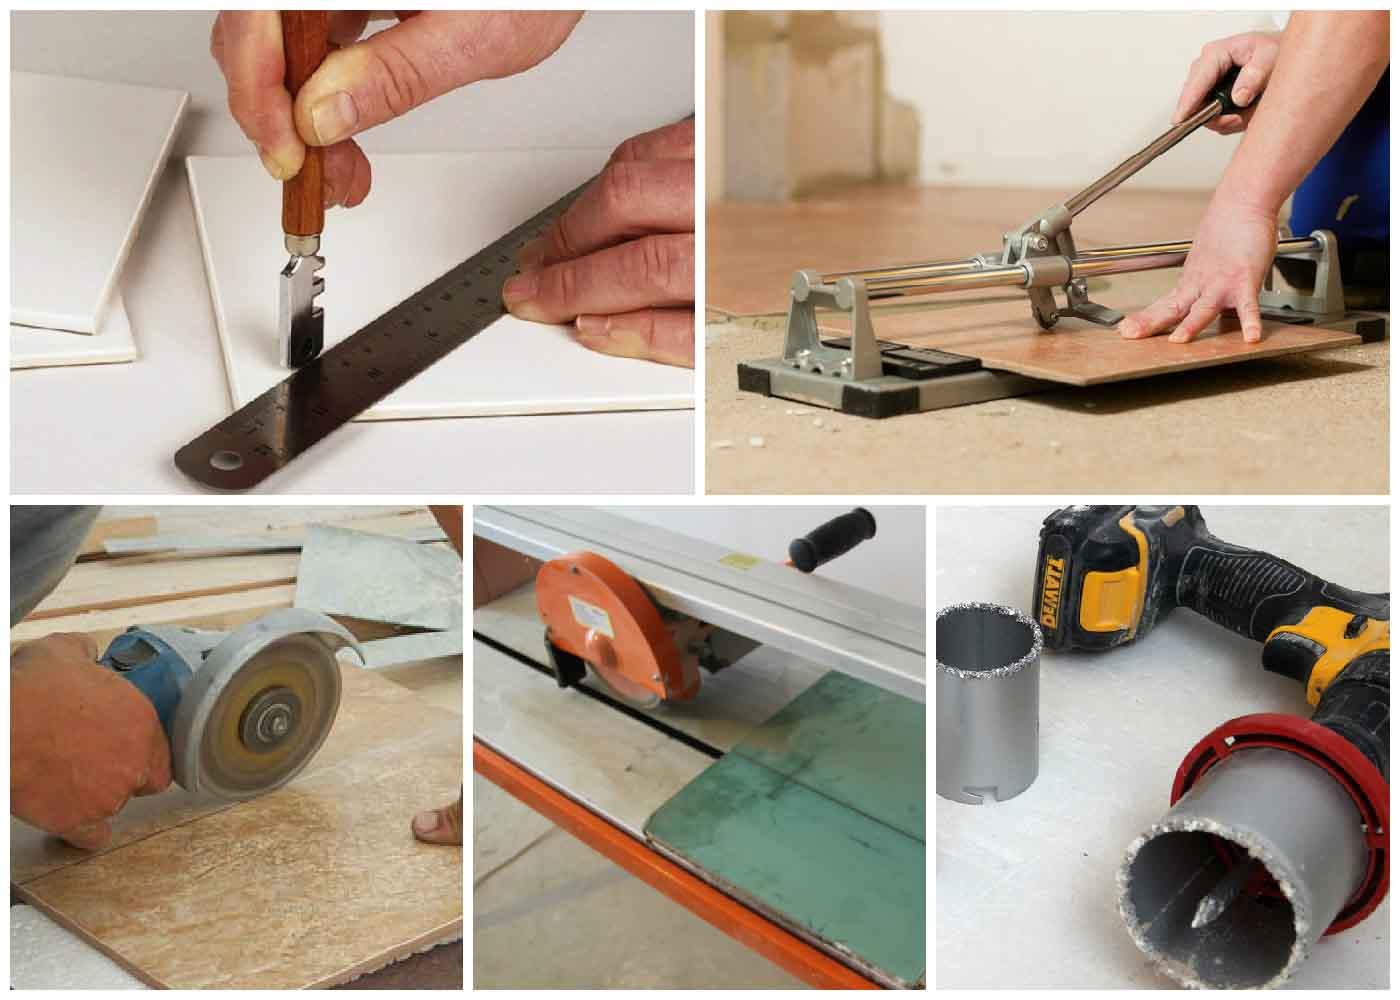 Как резать плитку без плиткореза » изобретения и самоделки